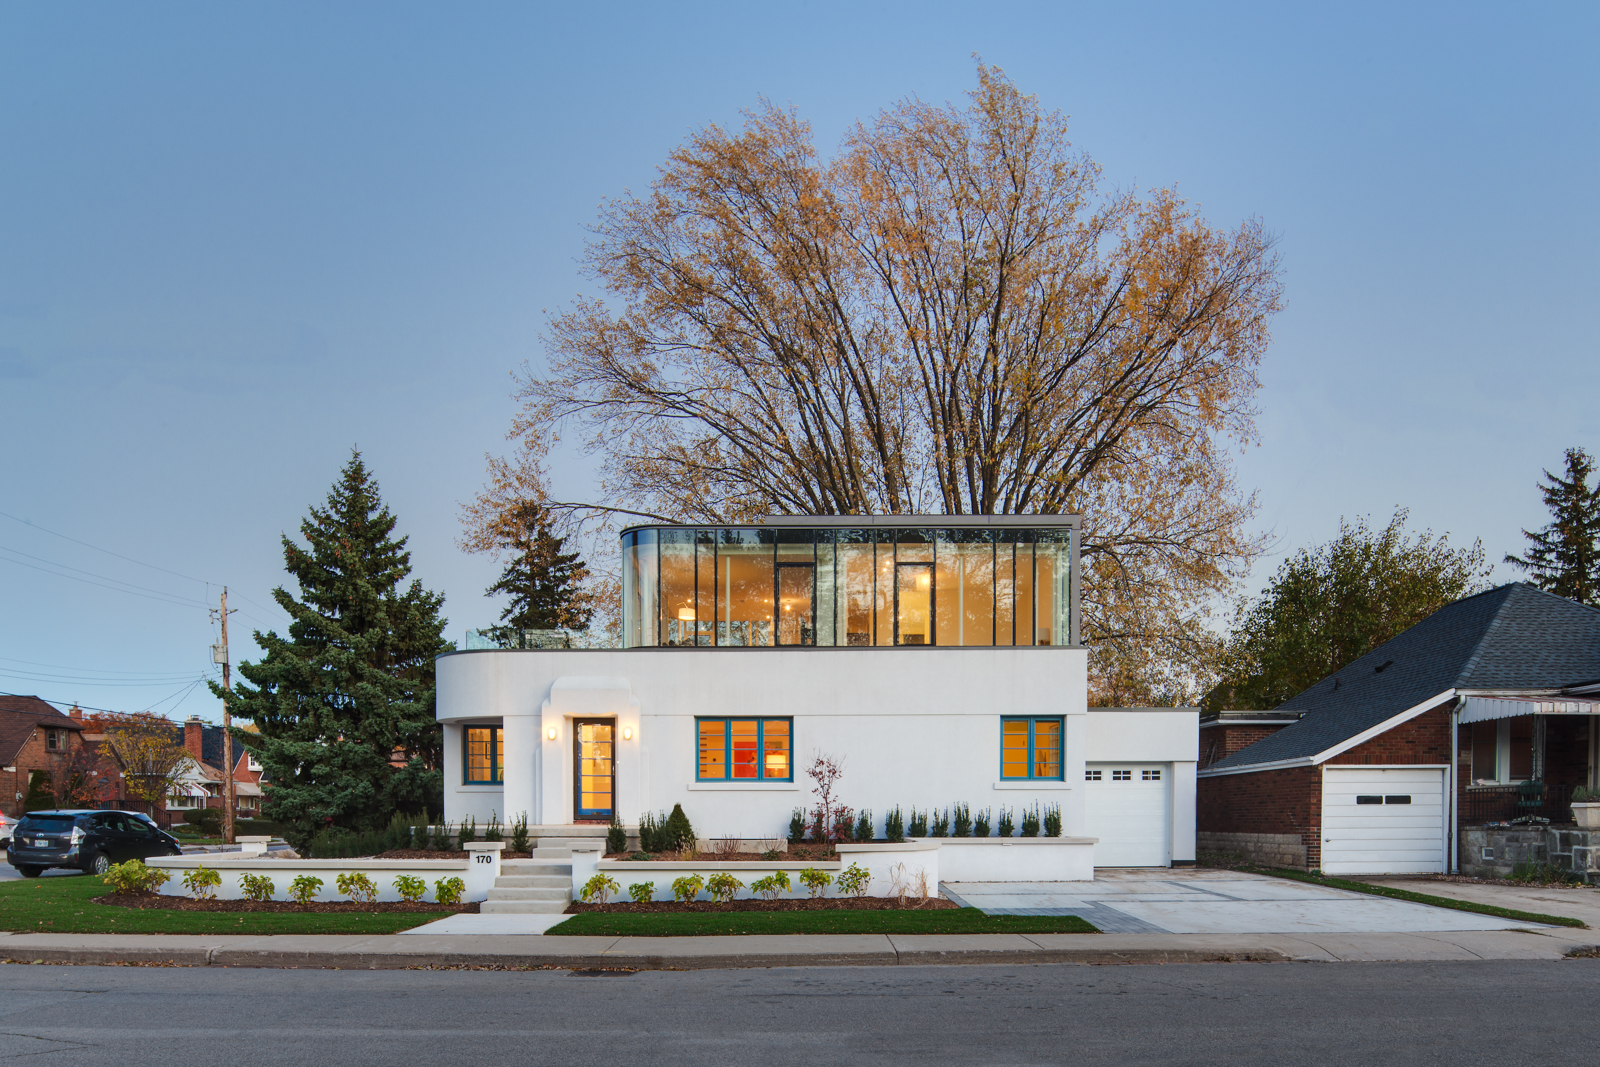 The Hambly House in Hamilton, Canada by DPAI & Toms + McNally Architecture